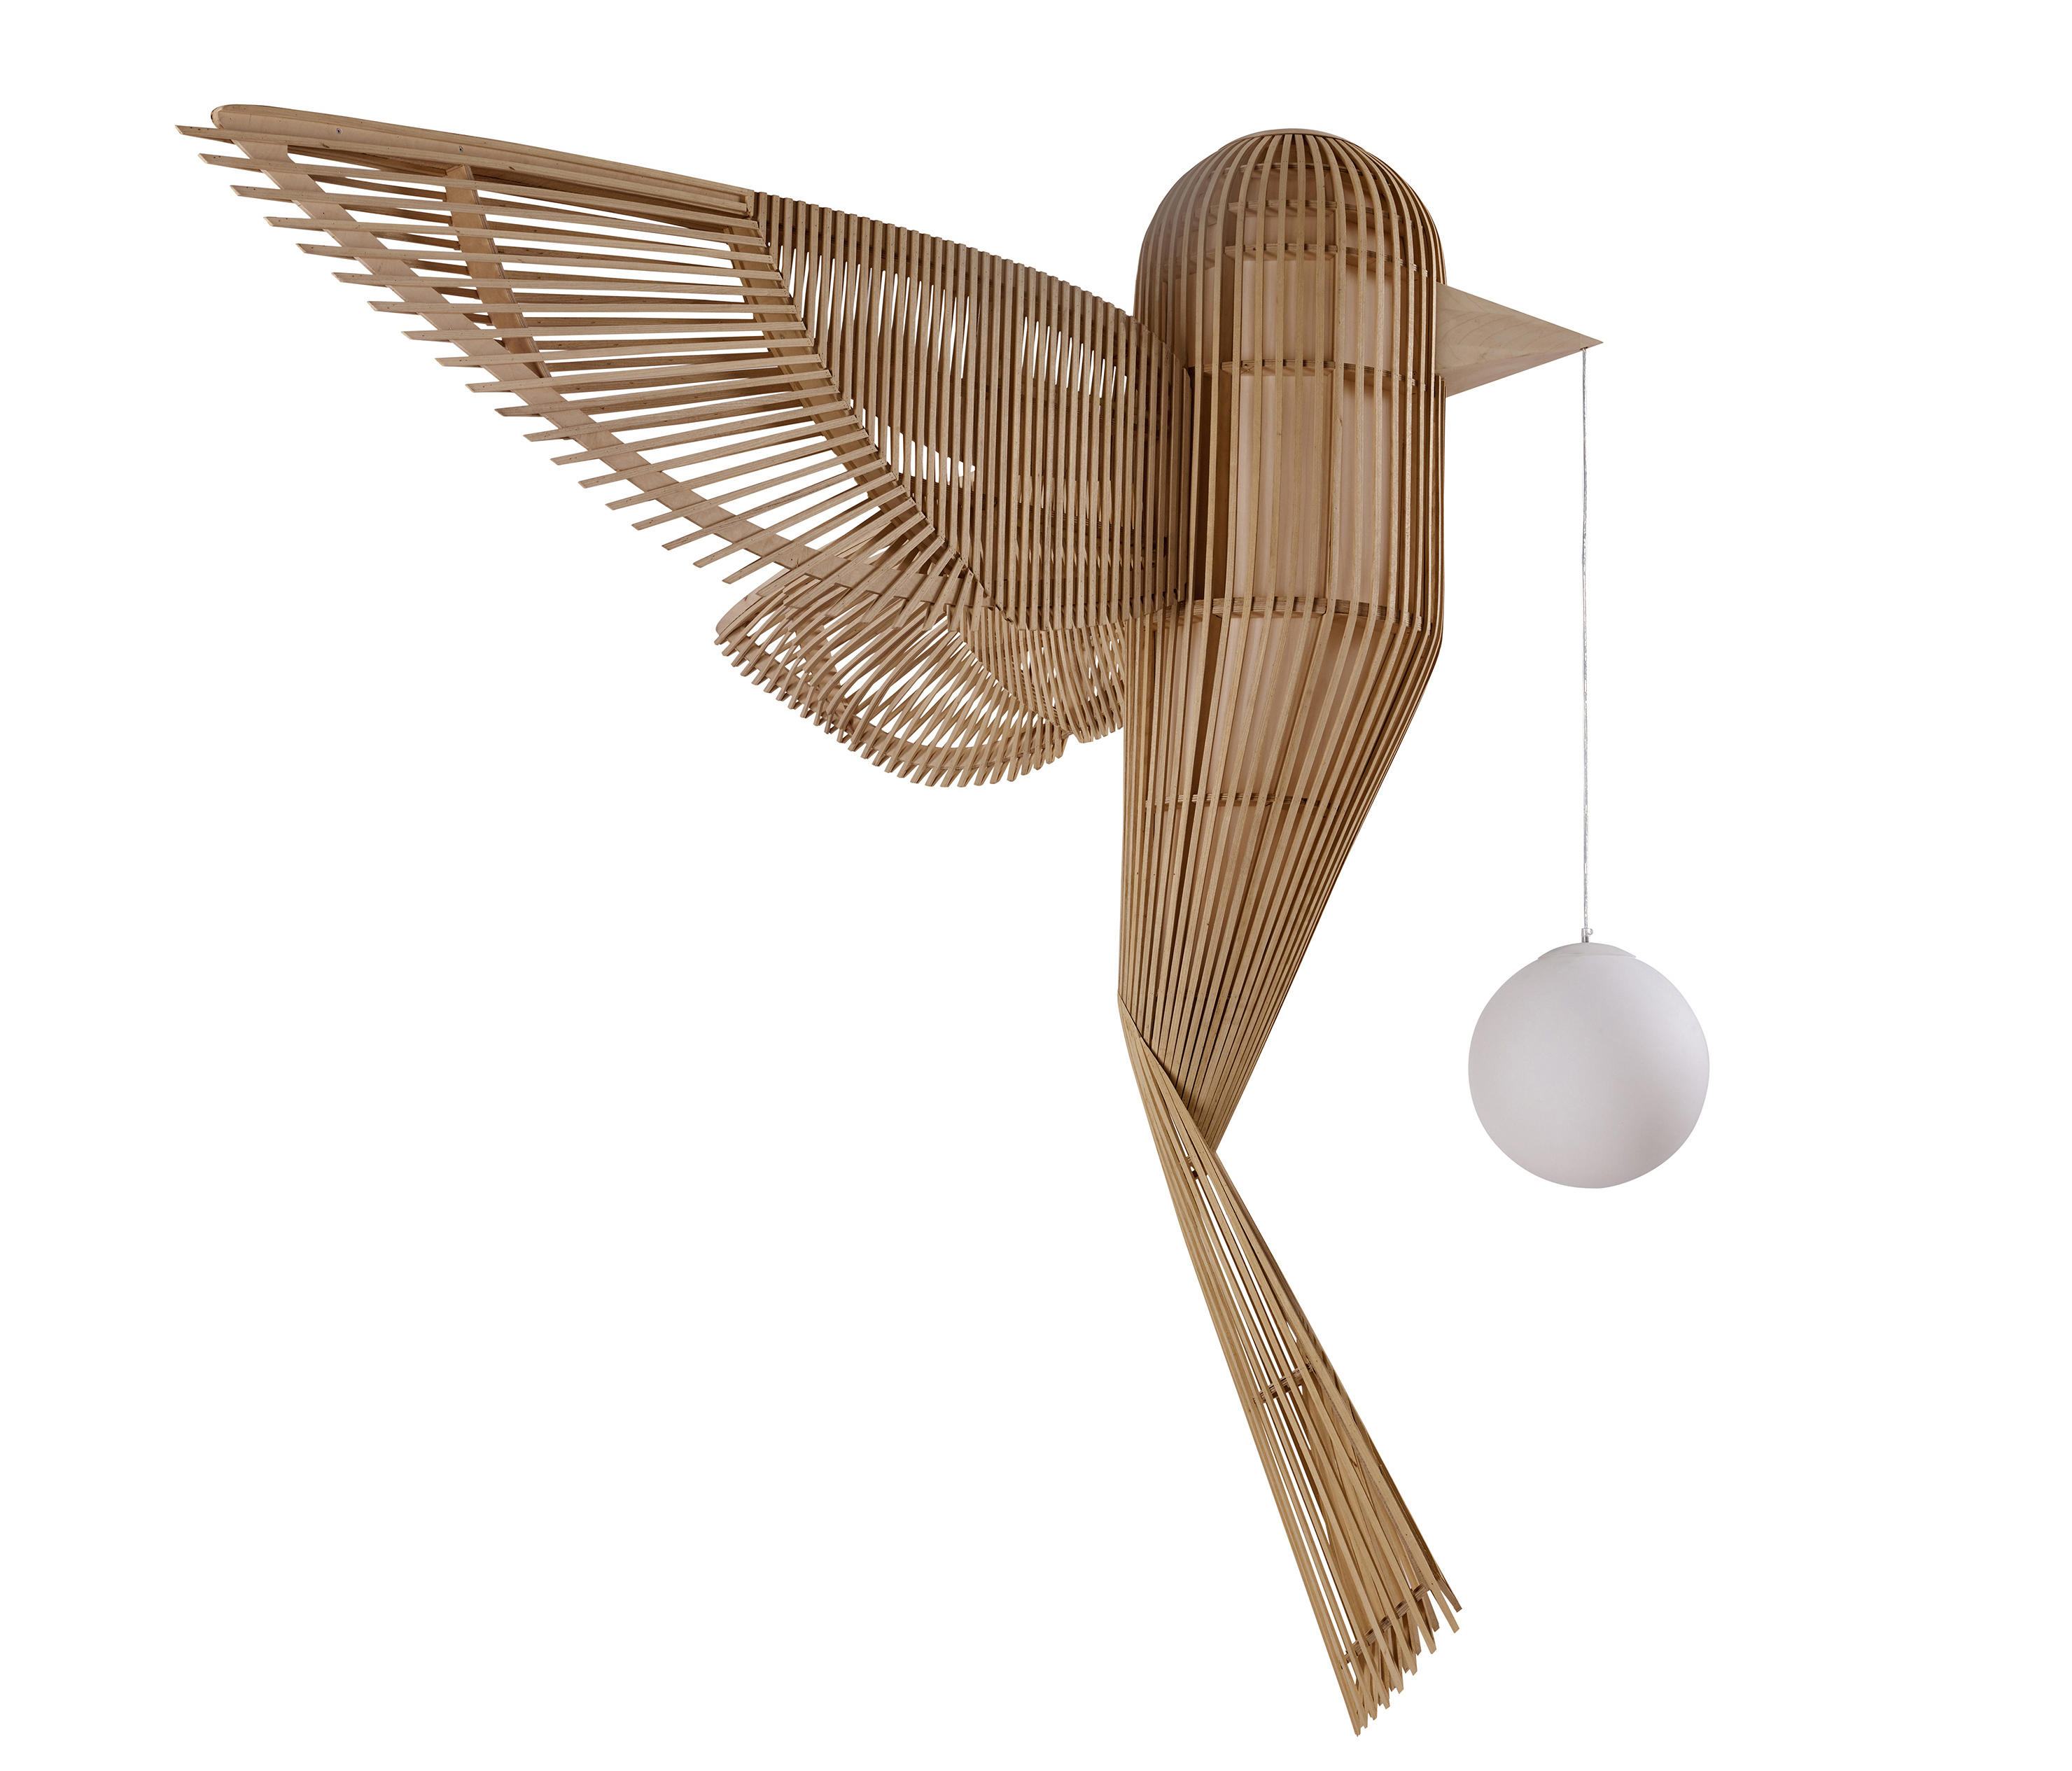 Big Bird Lamp by Isidro Ferrer for LZF